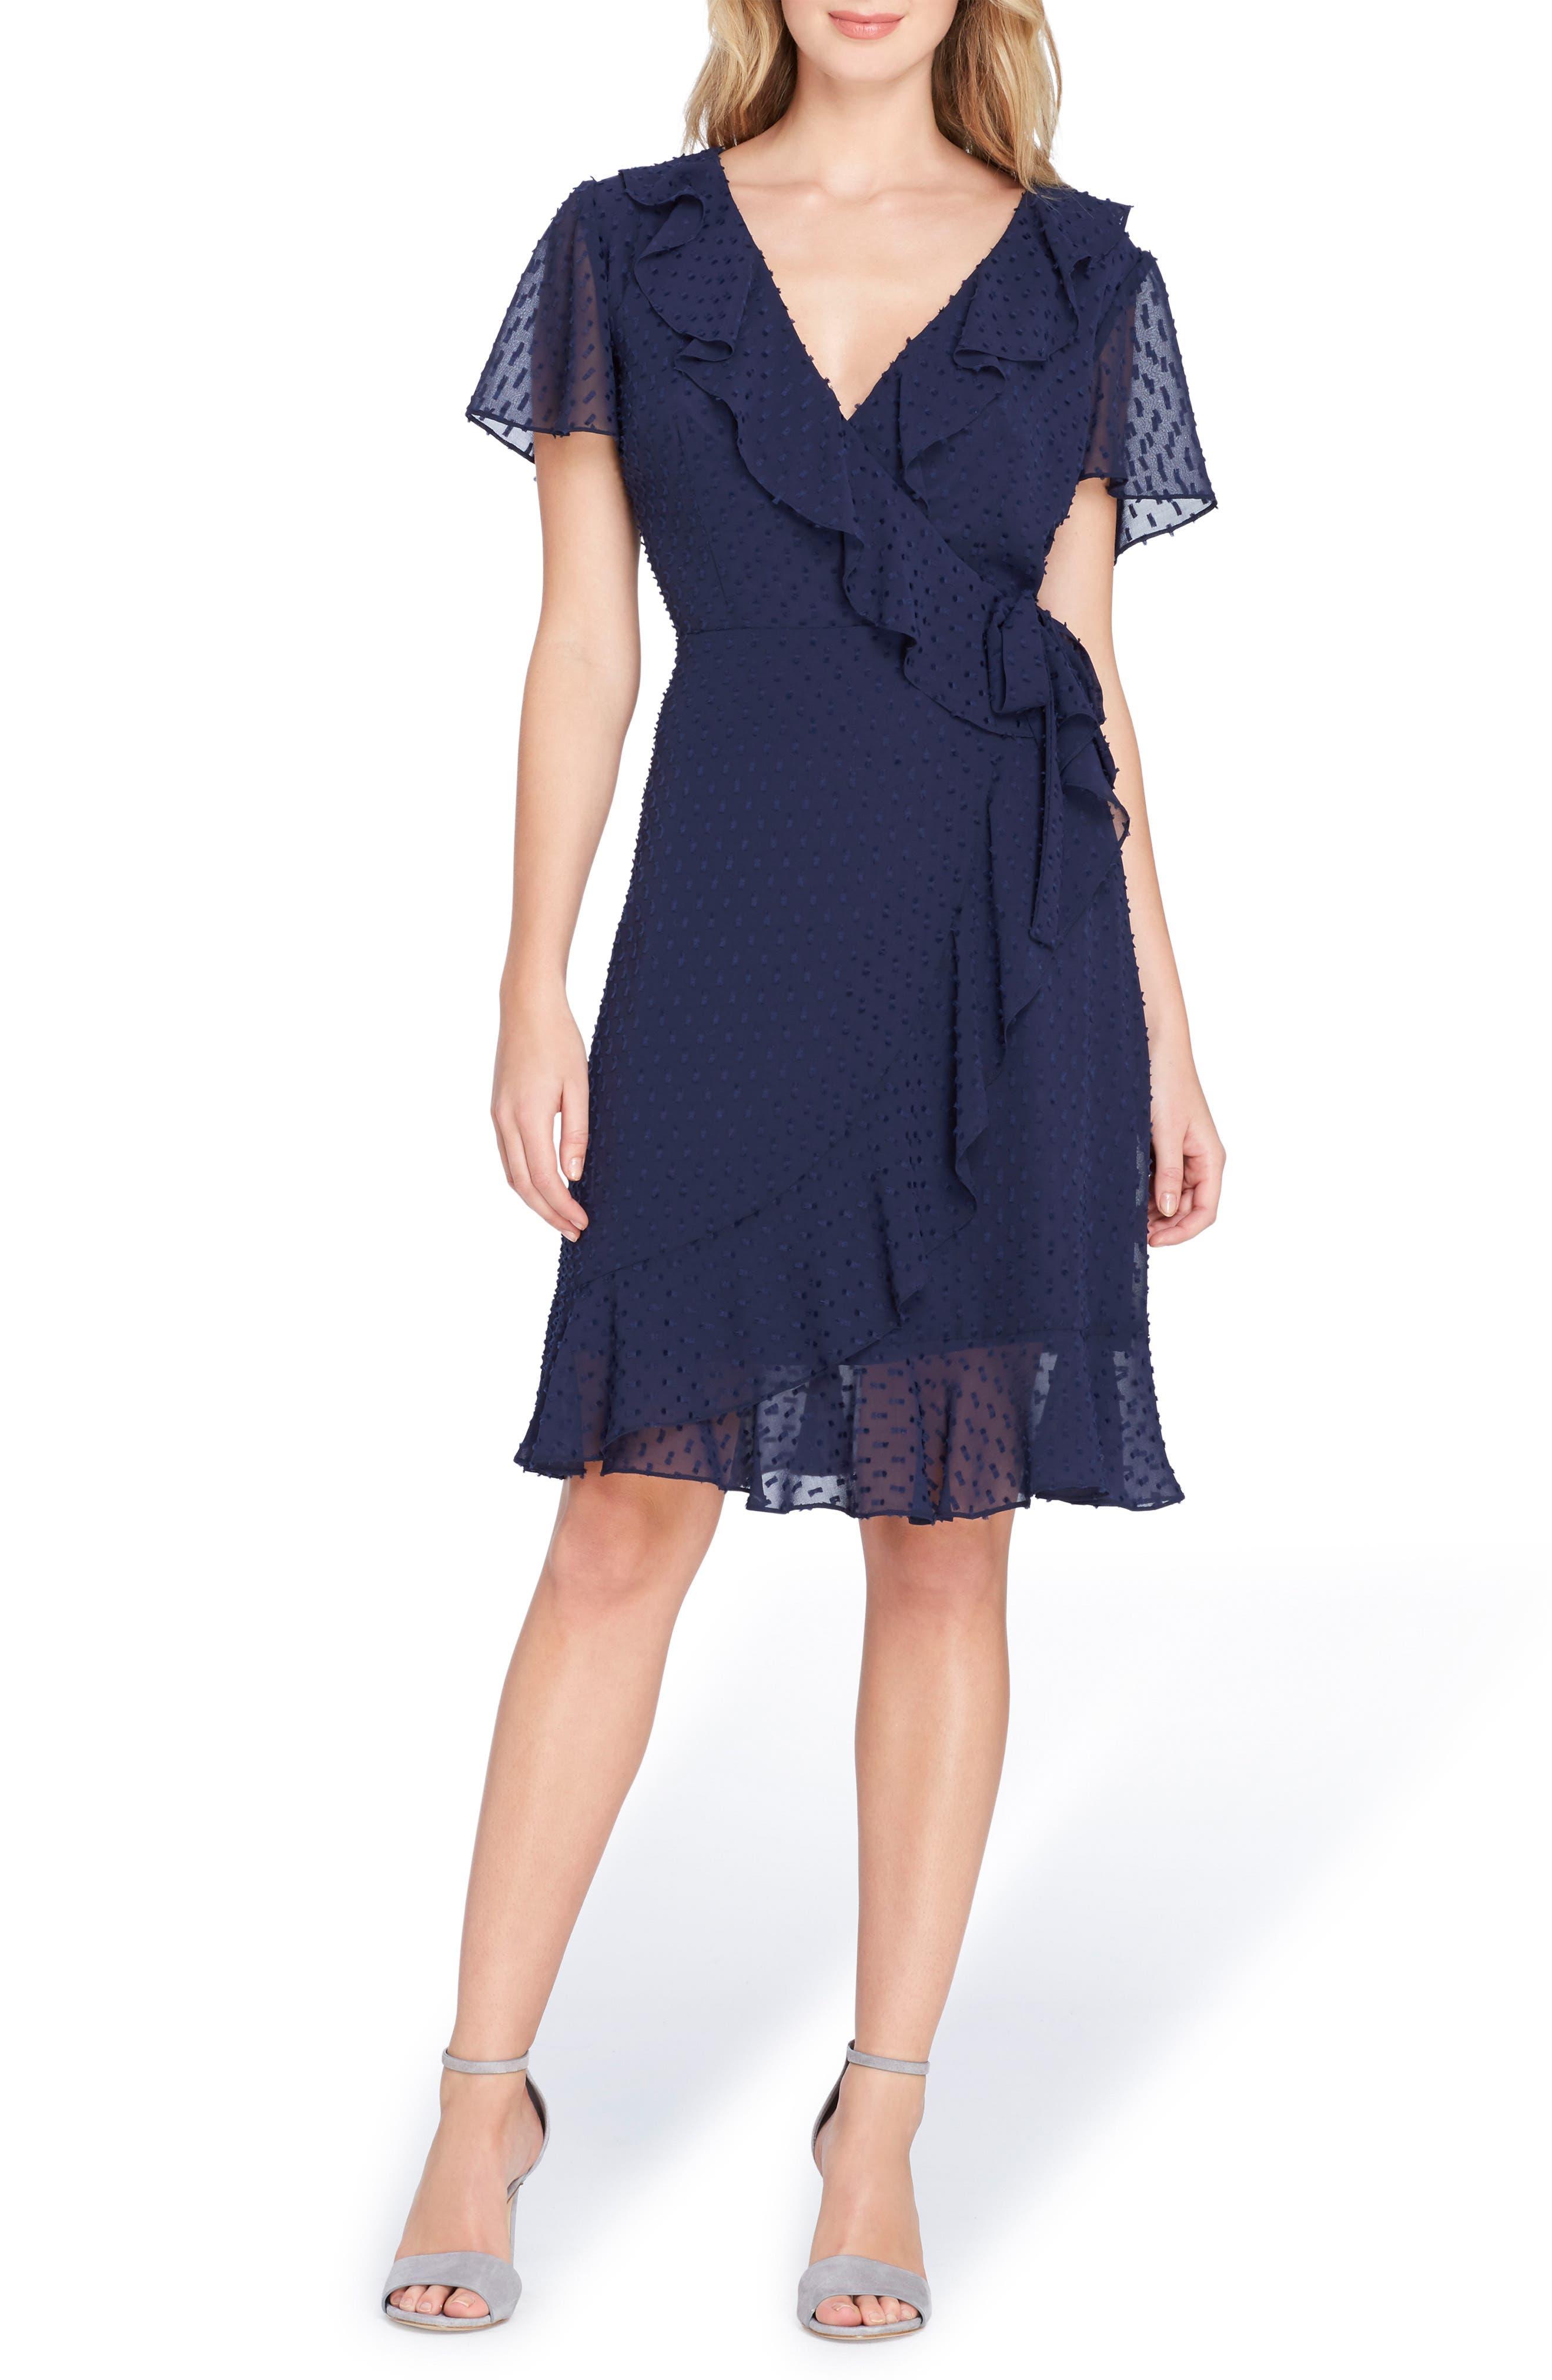 Swiss Dot Chiffon Dress,                             Main thumbnail 1, color,                             Navy